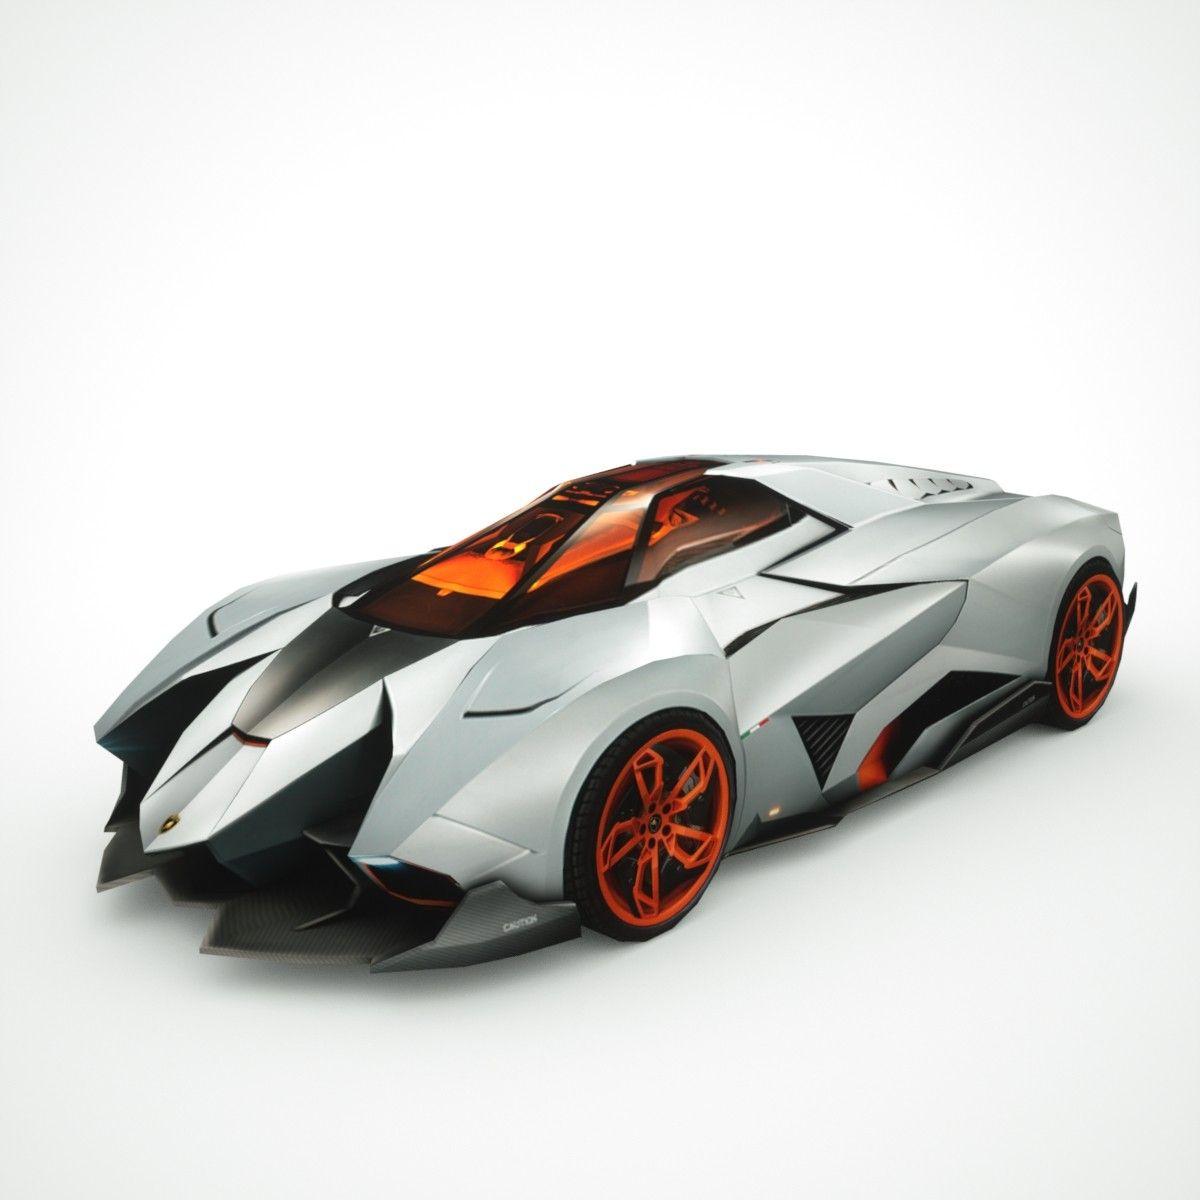 Lamborghini Egoista Inside: 3d Lamborghini Egoista Model - LGMSports.com